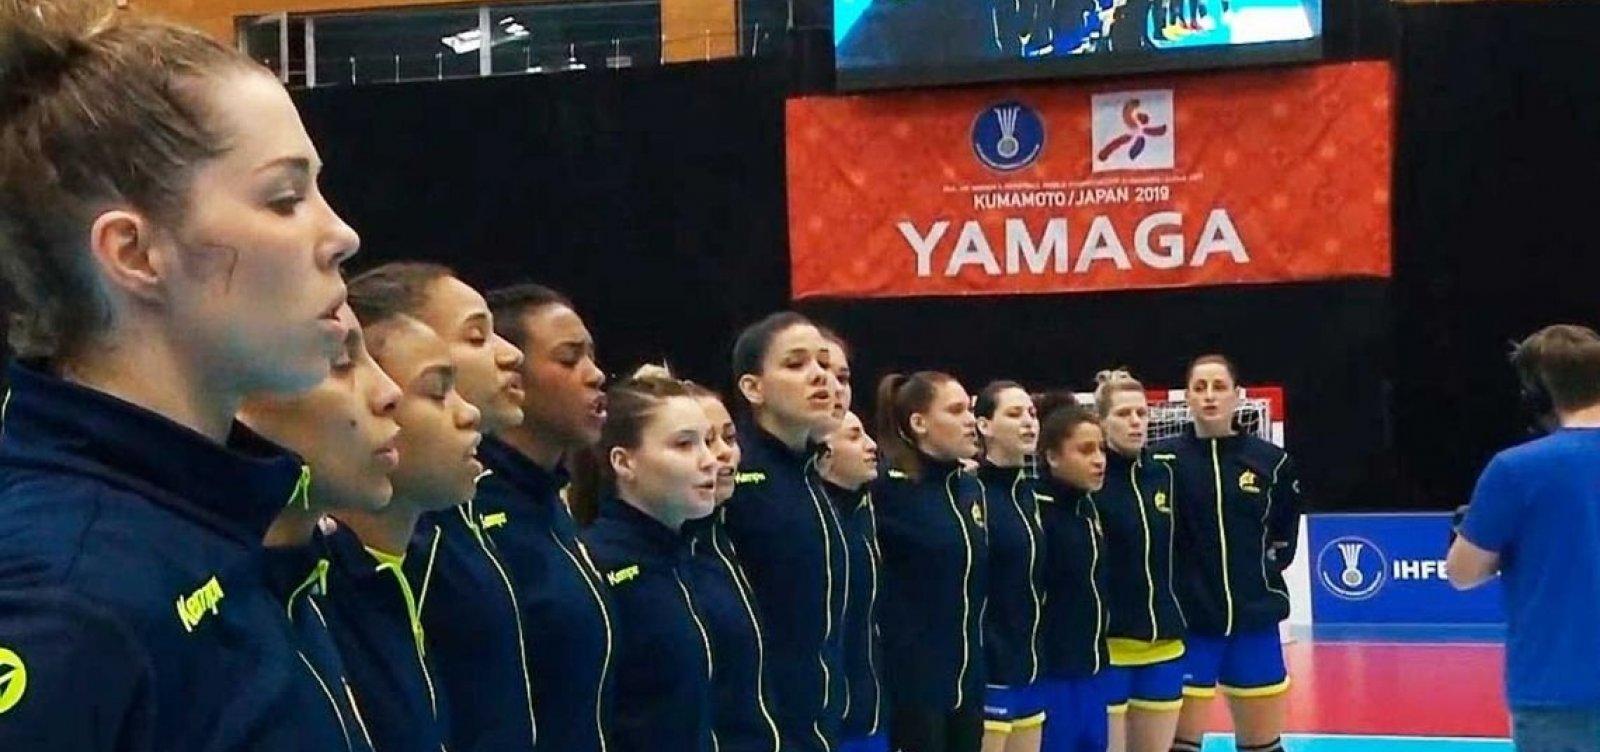 Brasil perde pela terceira vez e é eliminado na fase de grupos do Mundial de Handebol